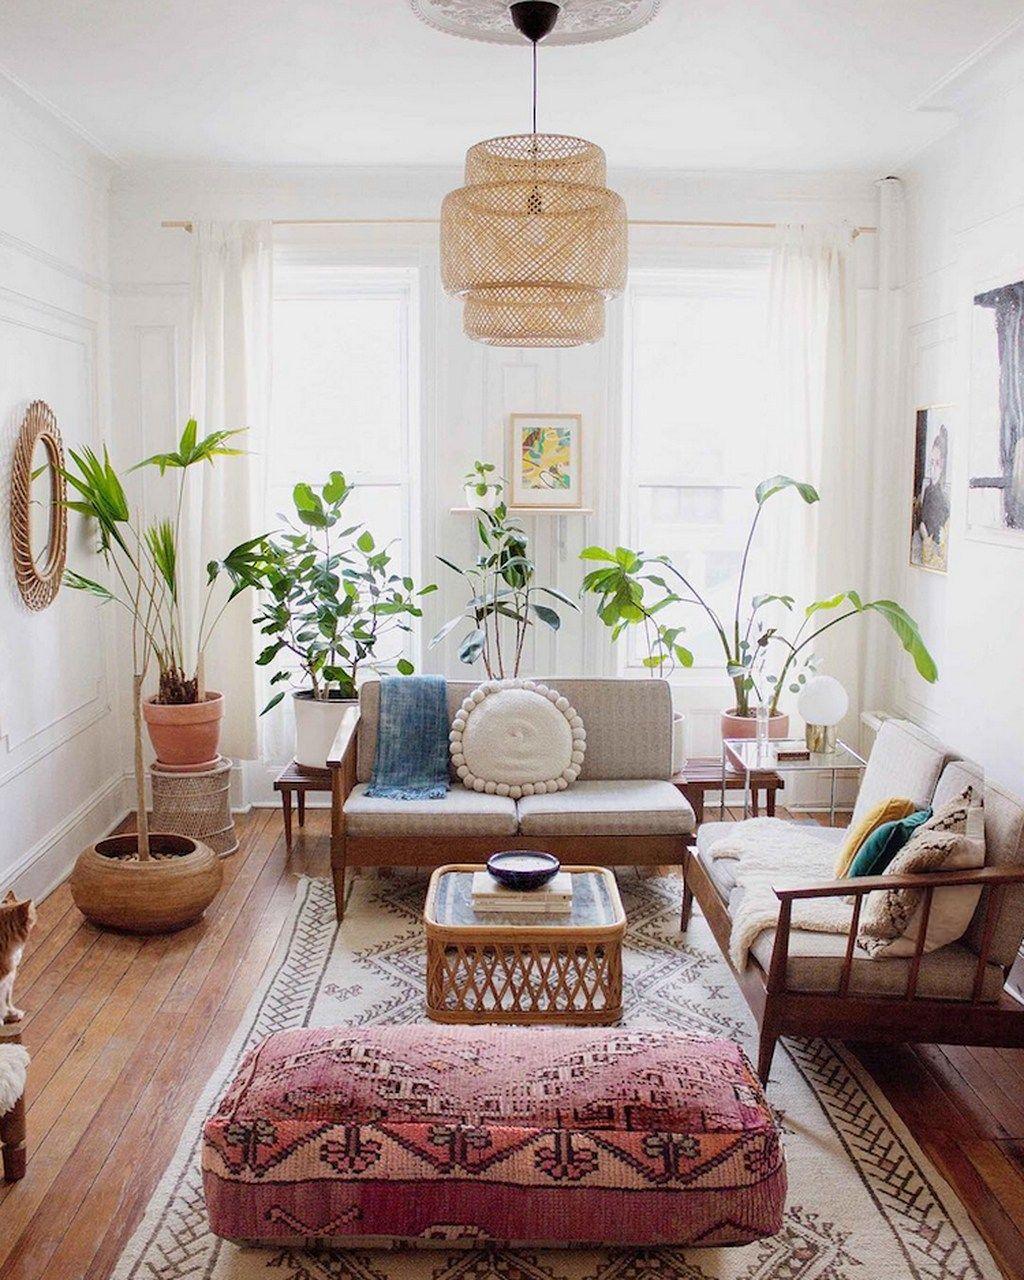 34 awesome farmhemian decor ideas to apply now boho chic living room chic living room on boho chic decor living room bohemian kitchen id=26857